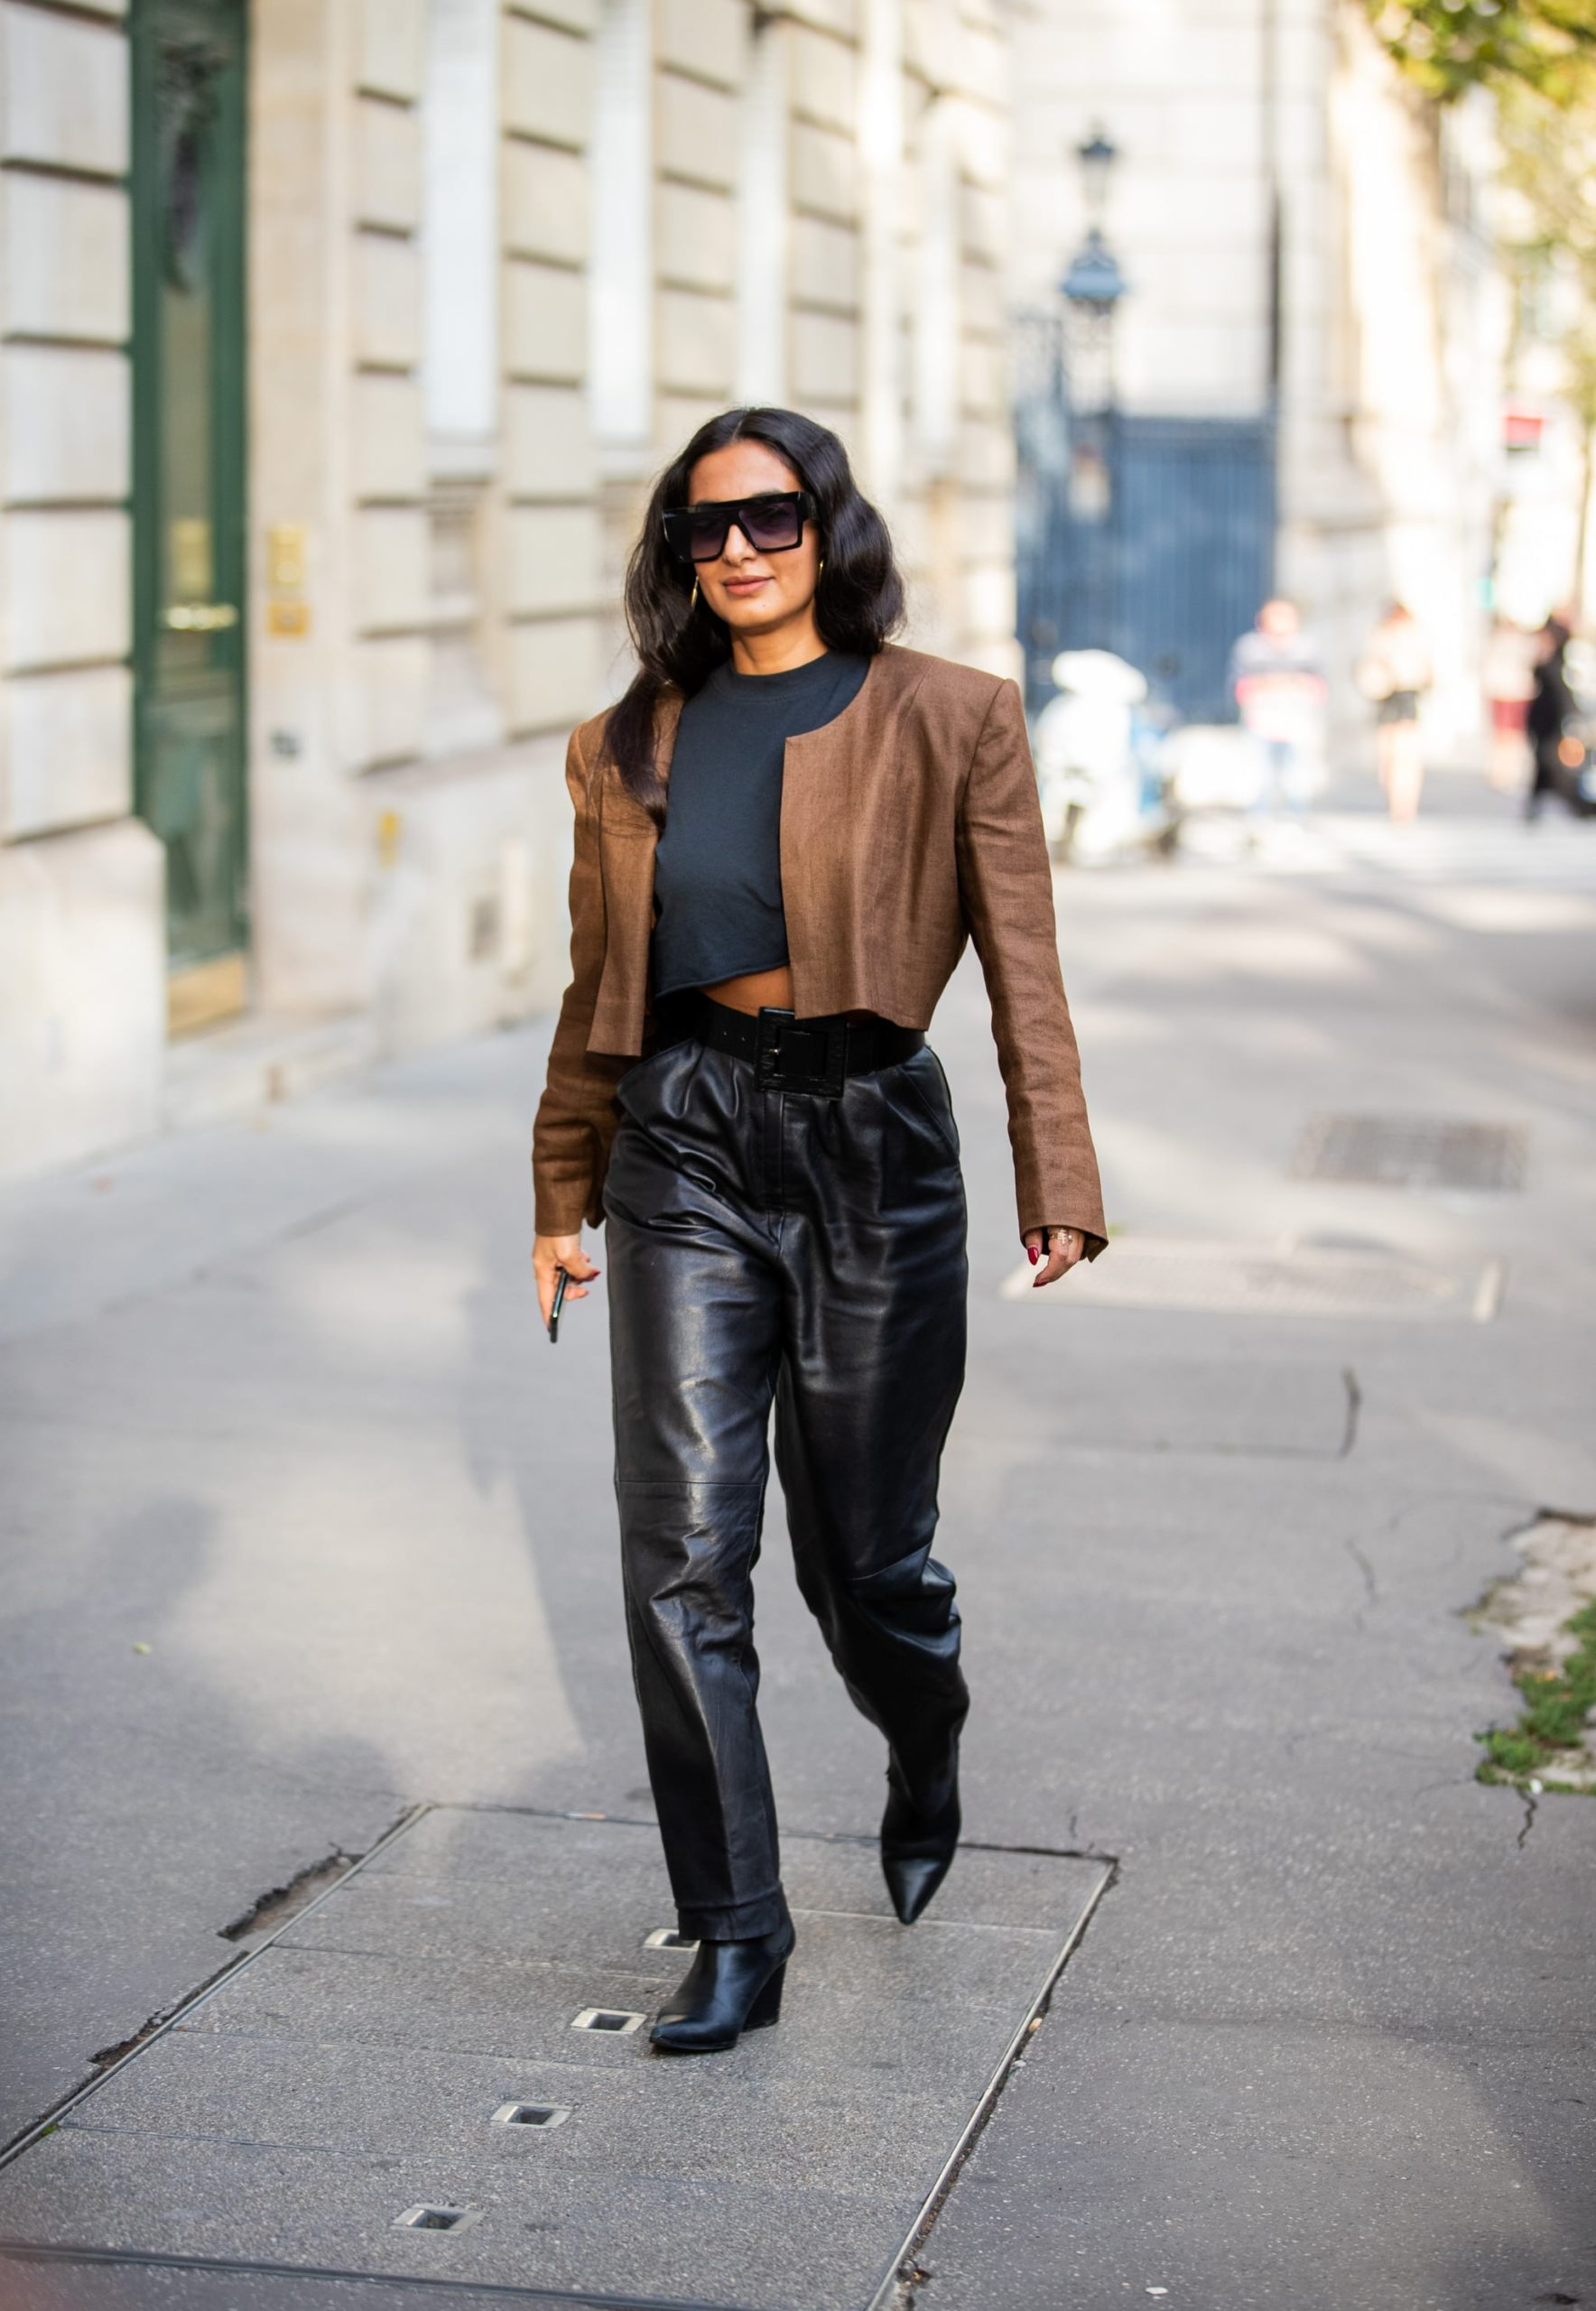 Women Leather Pants with Crop Top Under Blazer